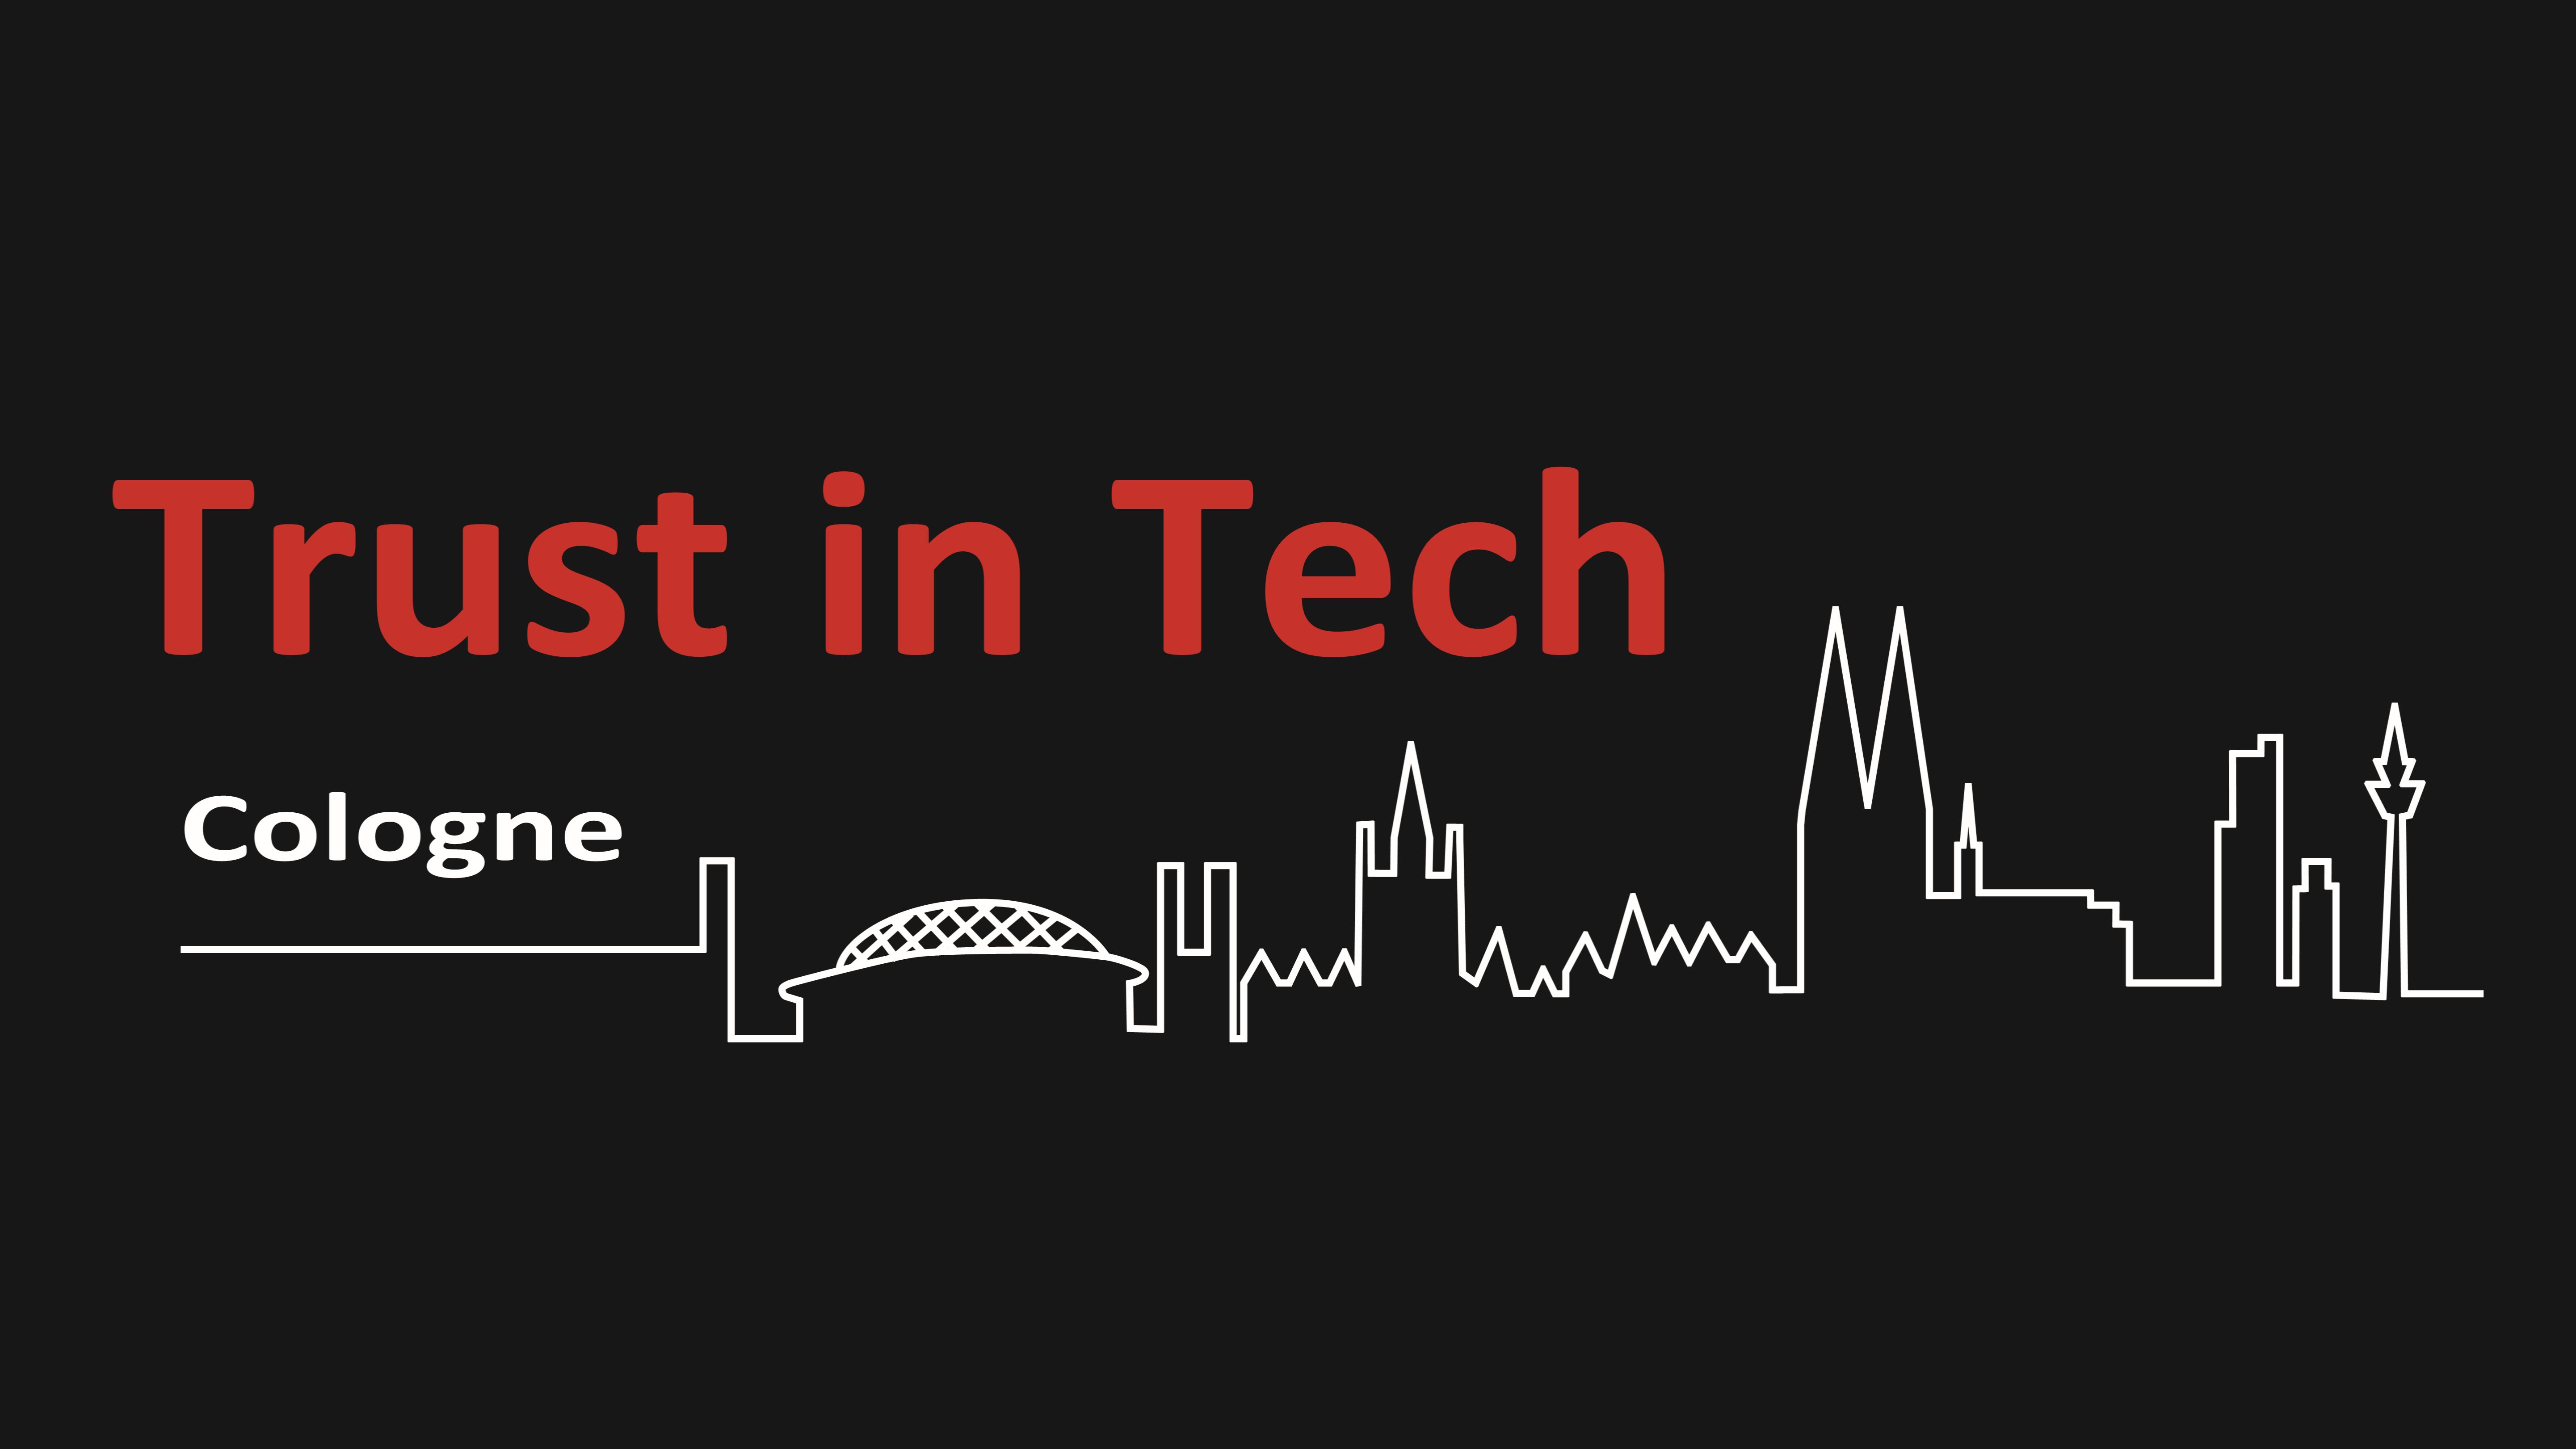 Trust in Tech Cologne